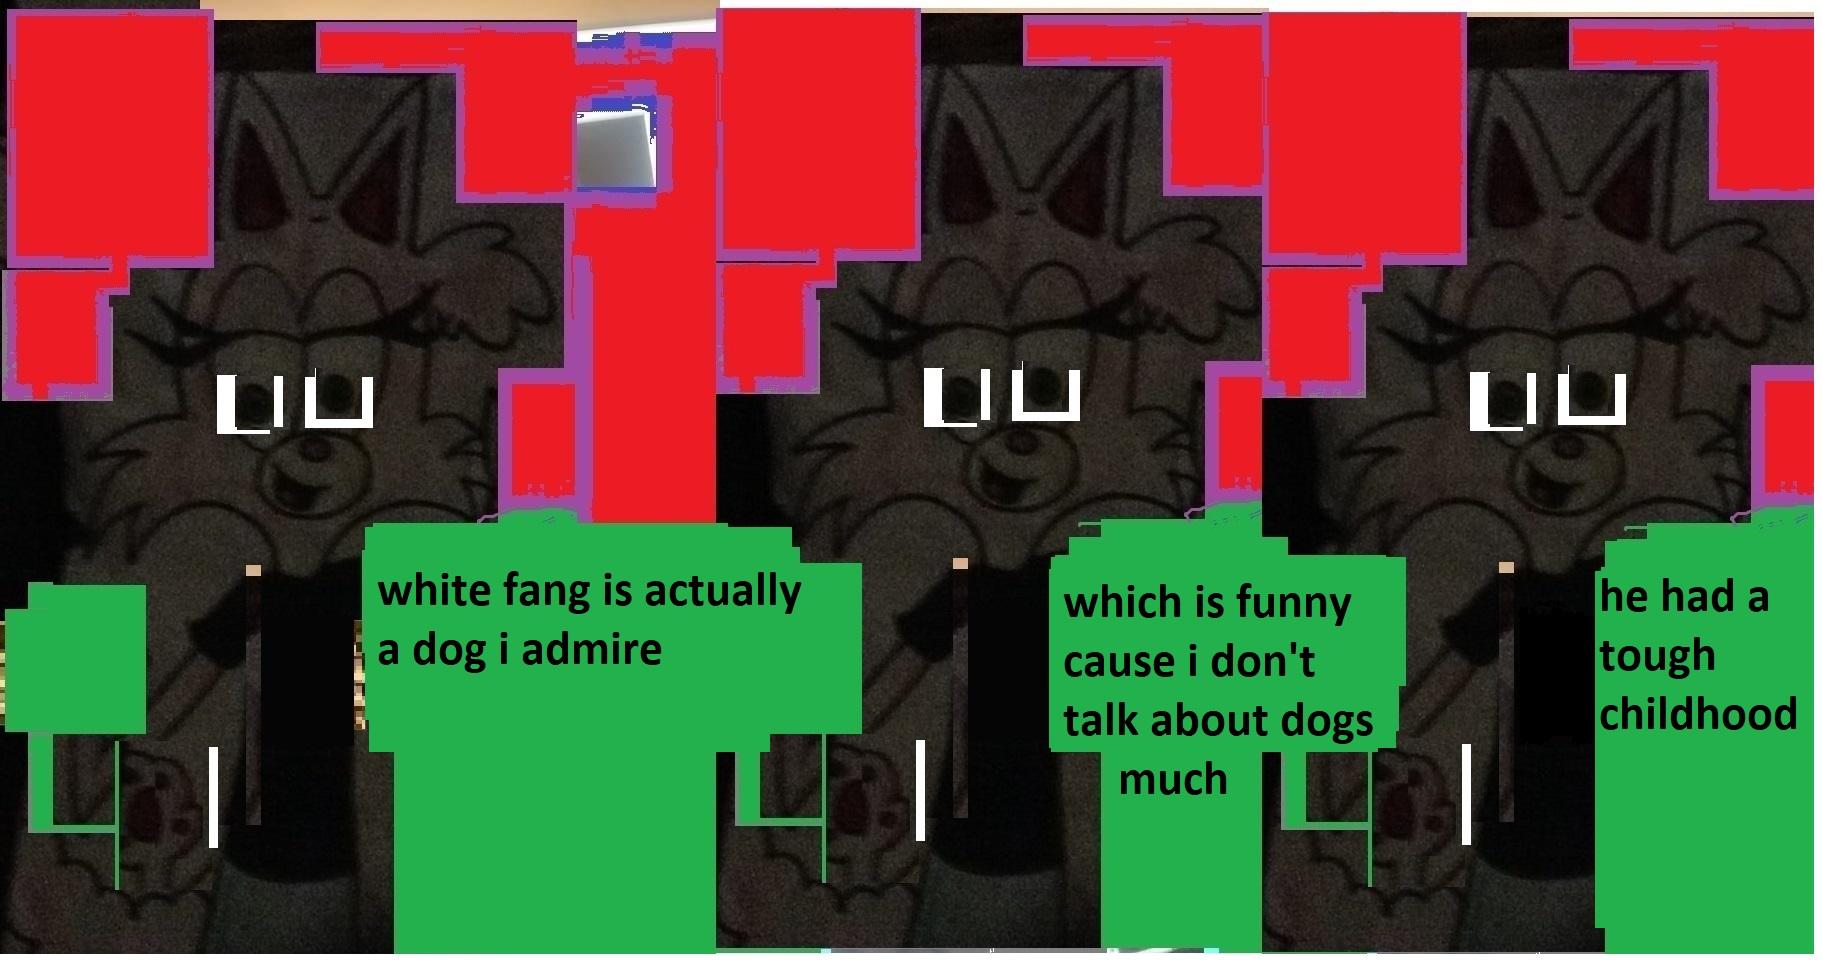 white fang comic